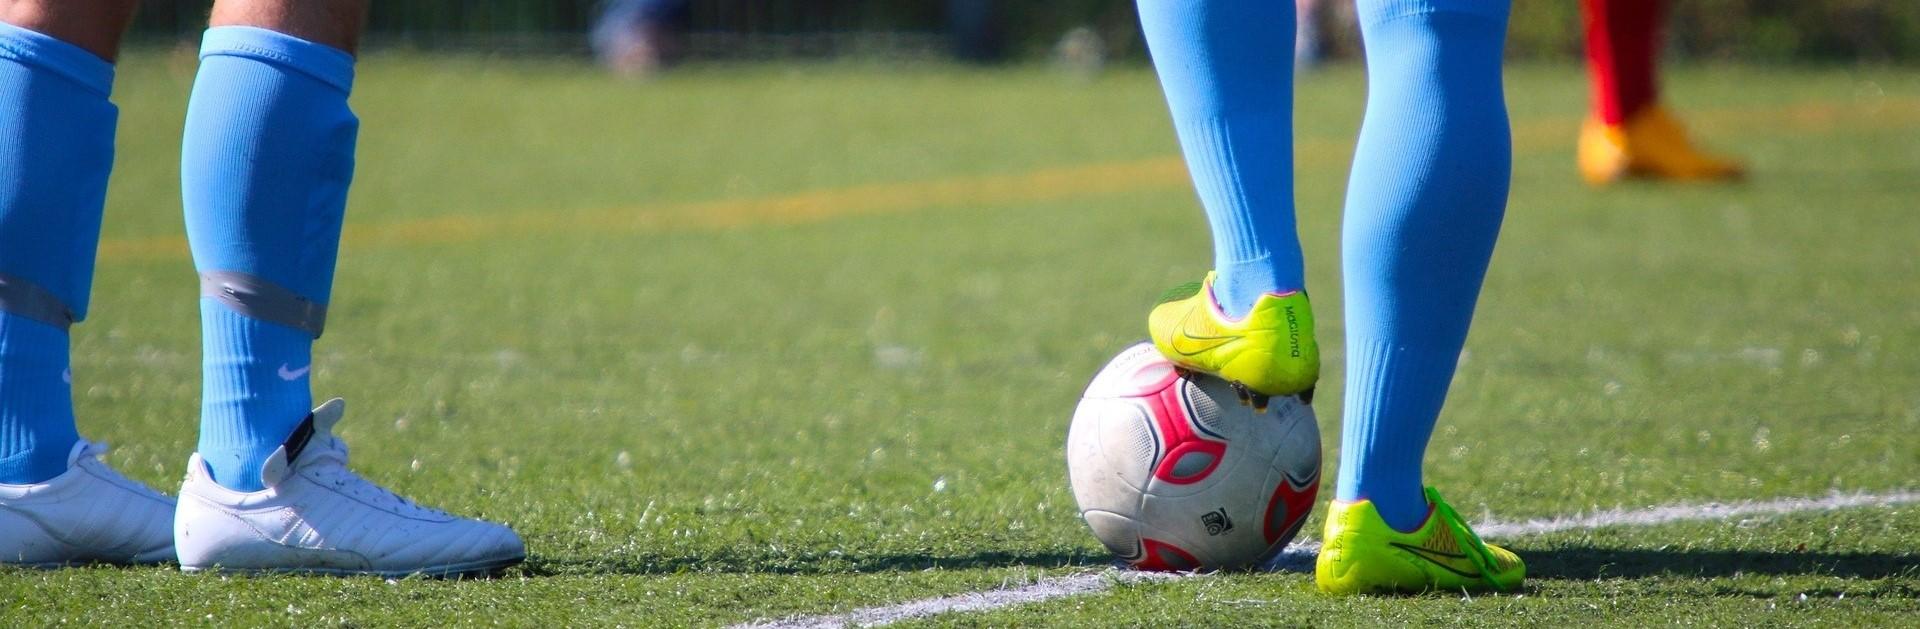 football-730418_1920 (2)